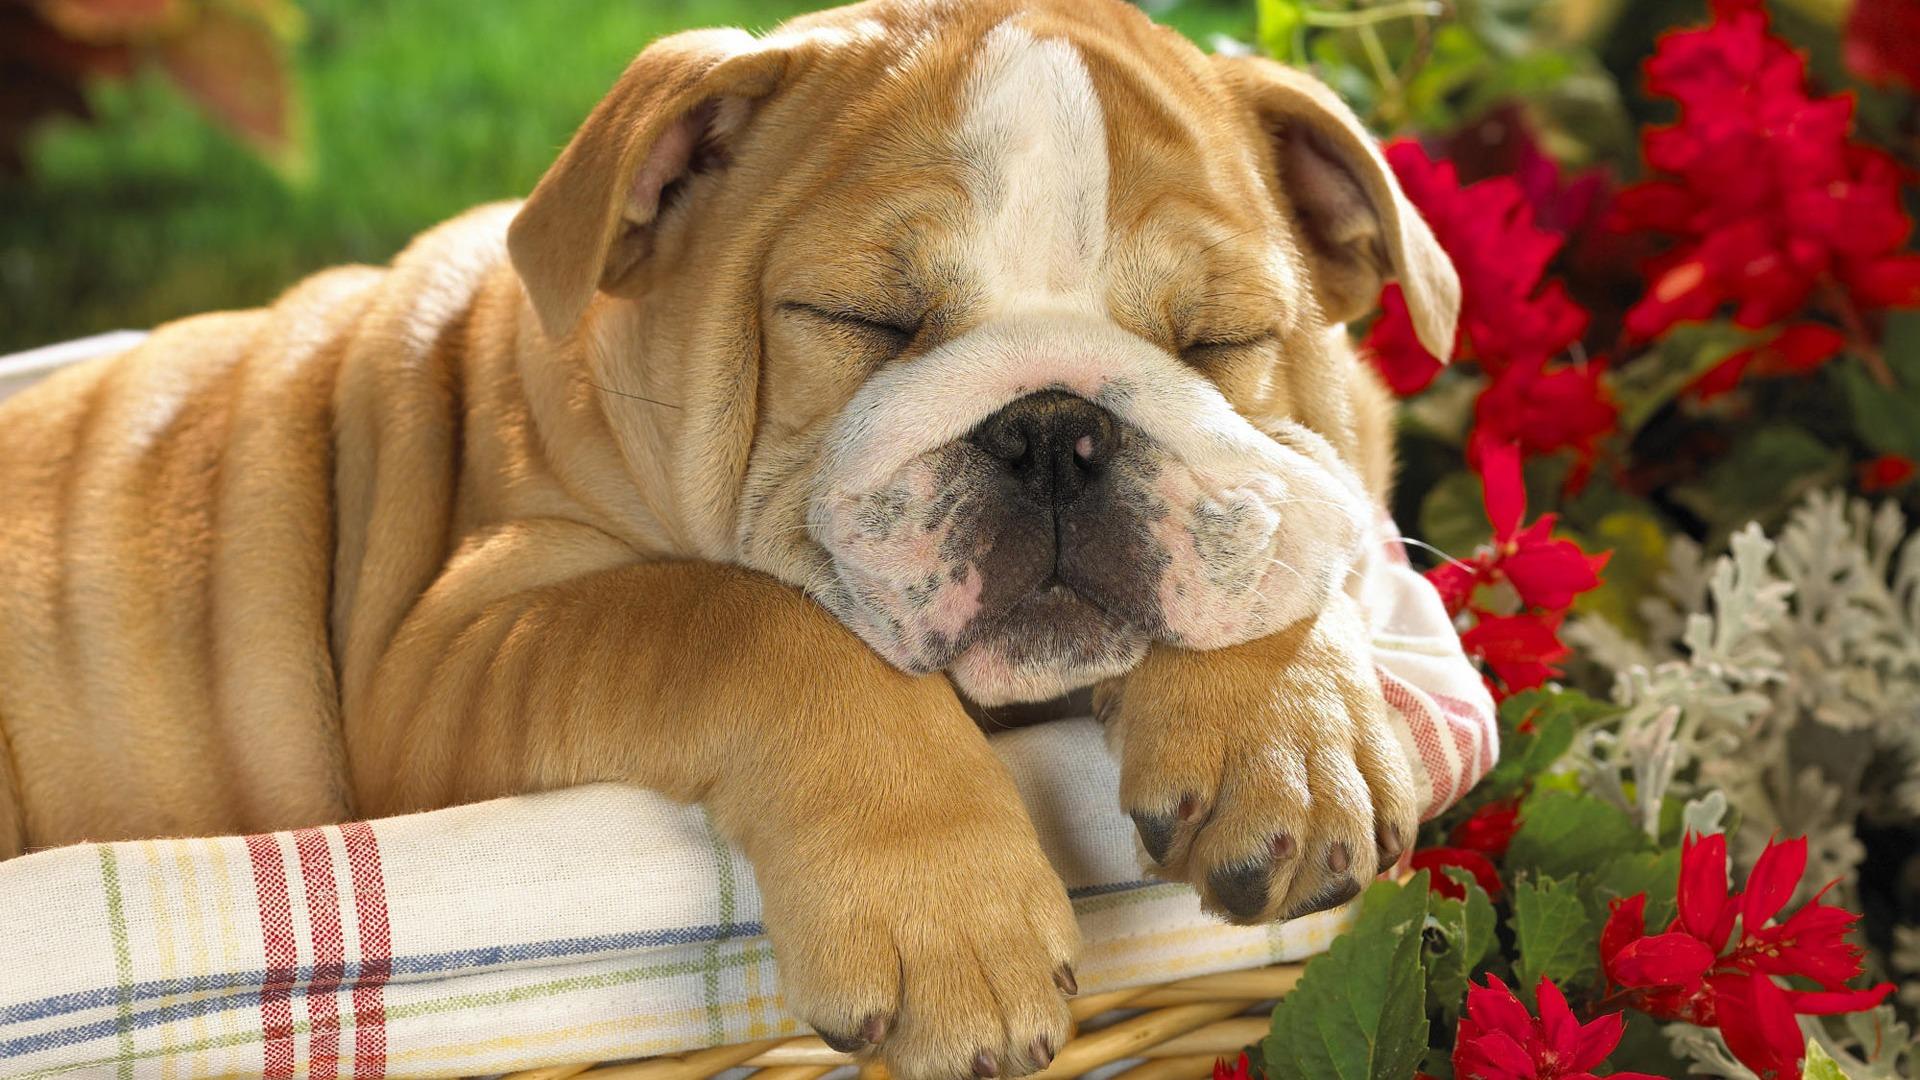 Hd Wallpaper Cute Dog 20 1920x1080 Wallpaper Download